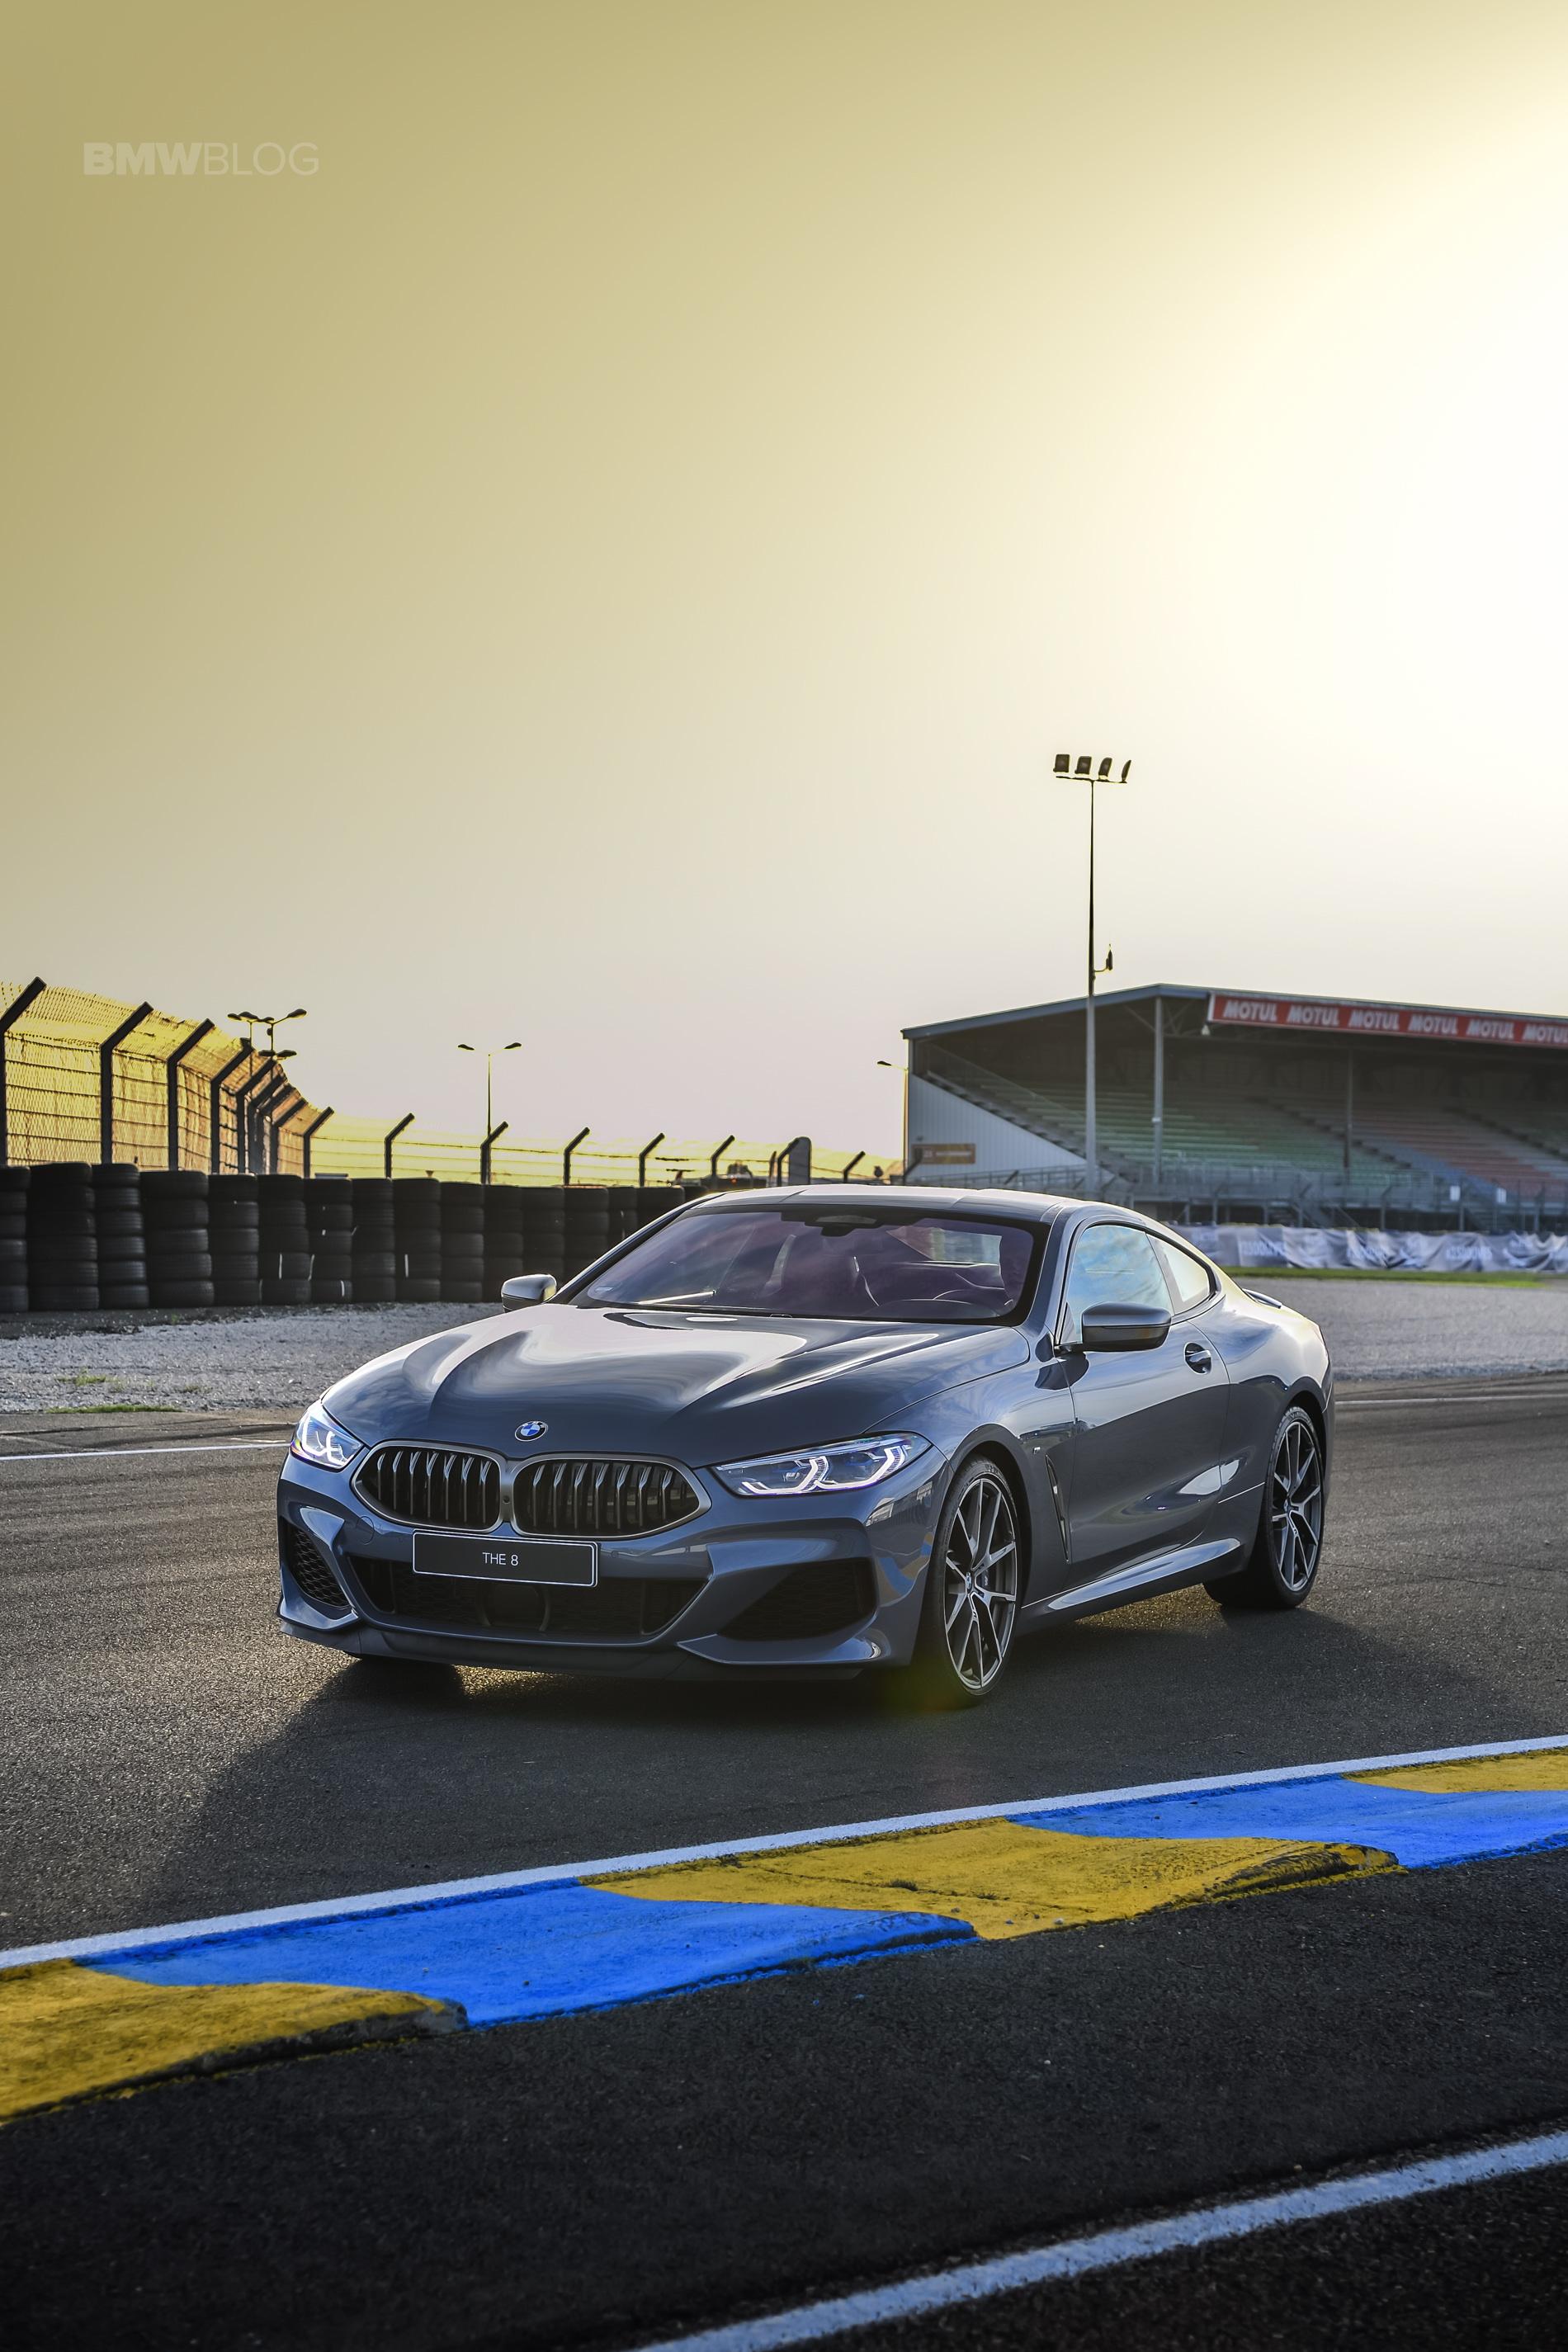 BMW 8 Series track Le mans 2018 01